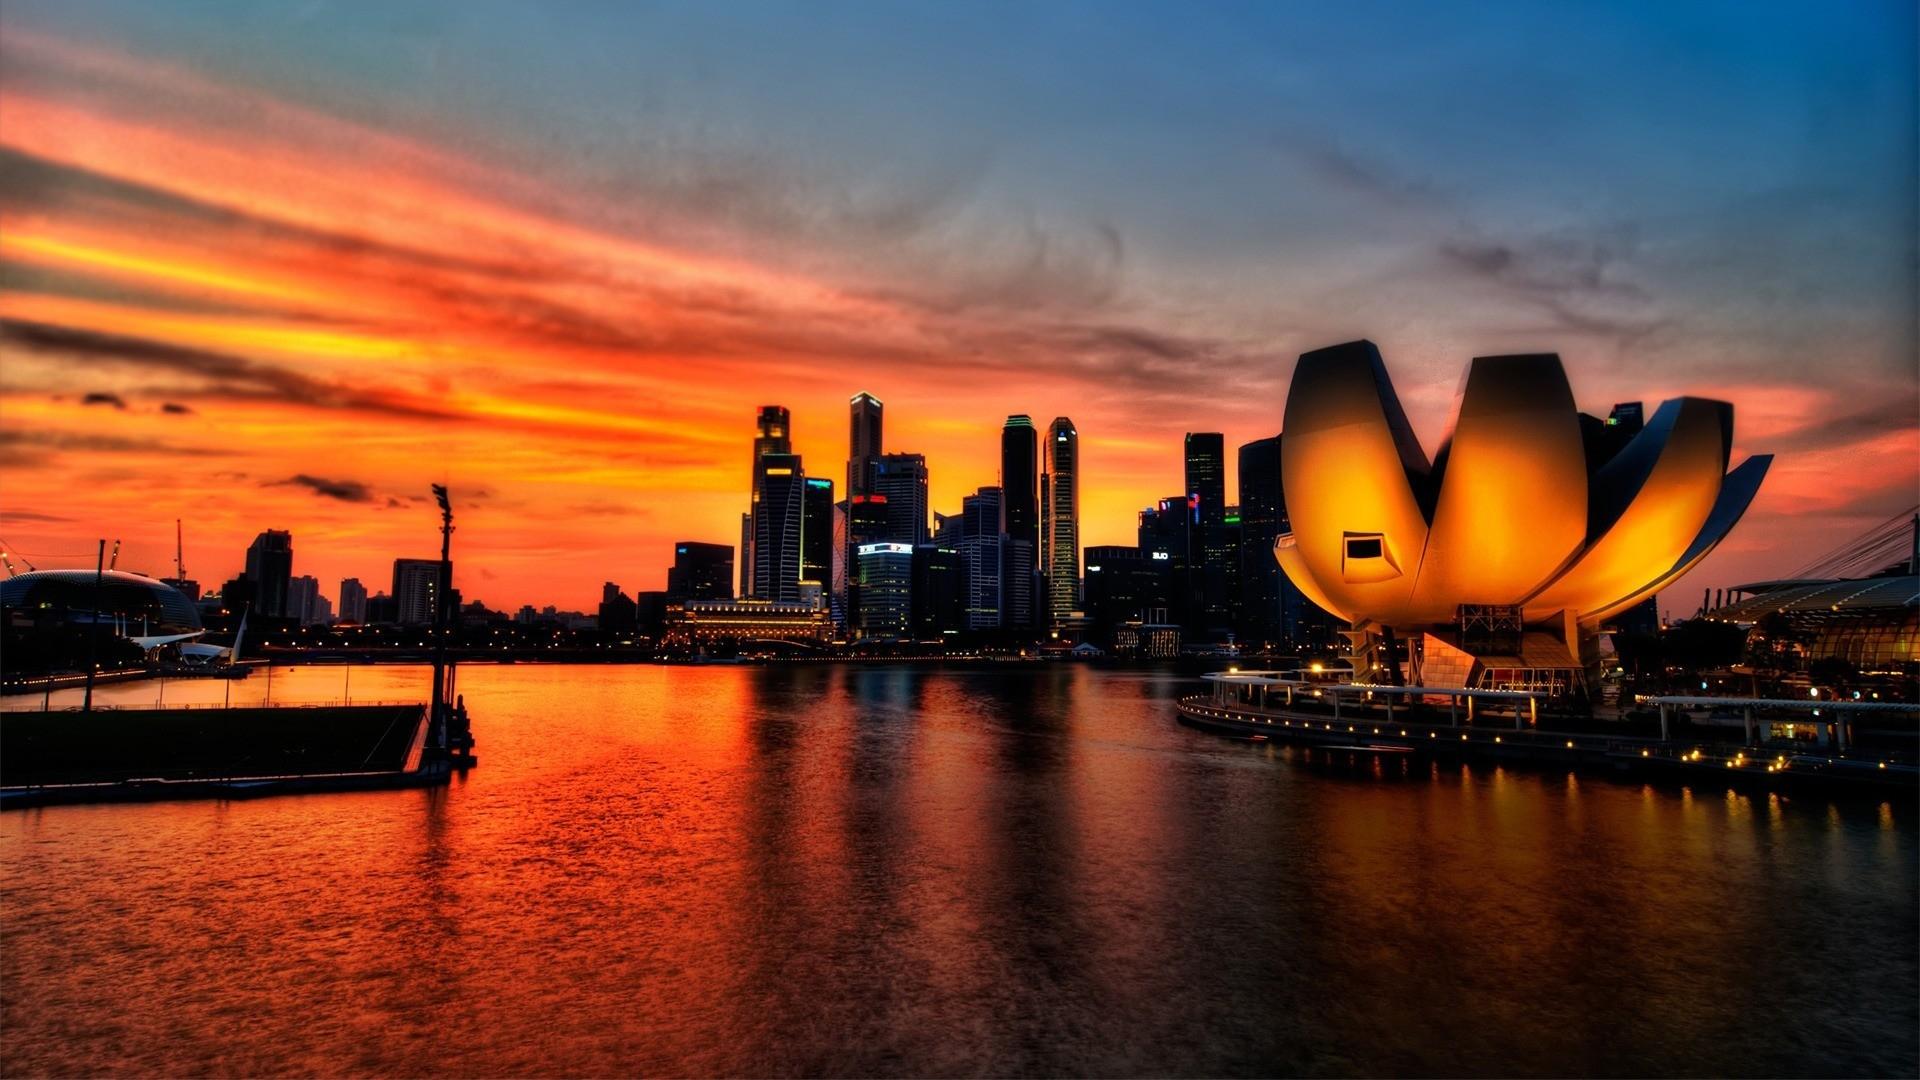 city sunset wallpaper 7106 - photo #9